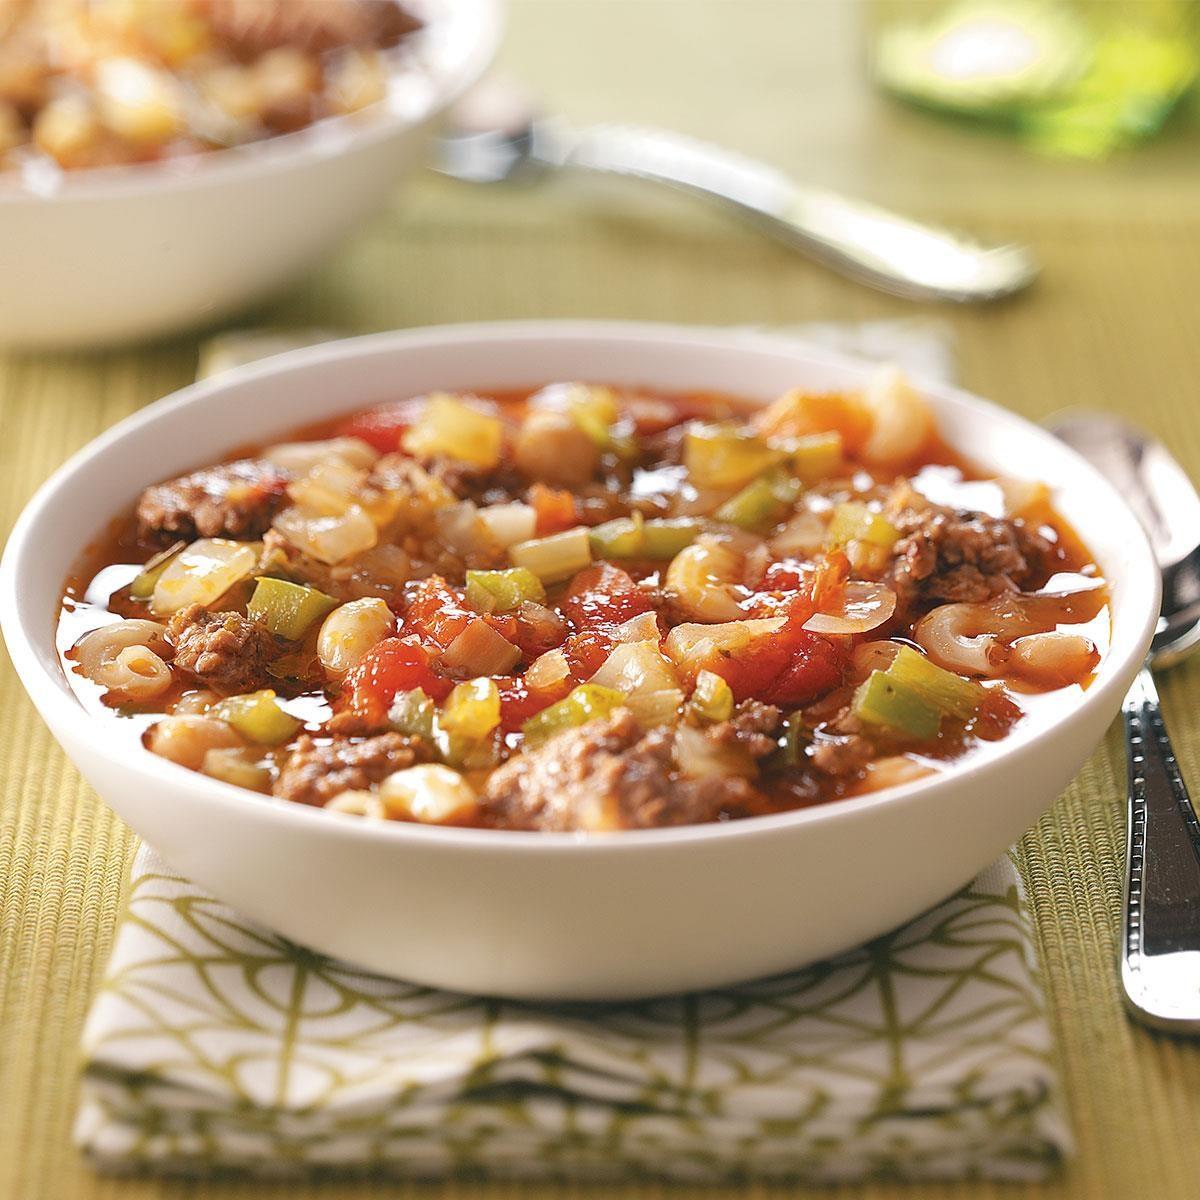 Potluck Pasta Soup Recipe | Taste of Home